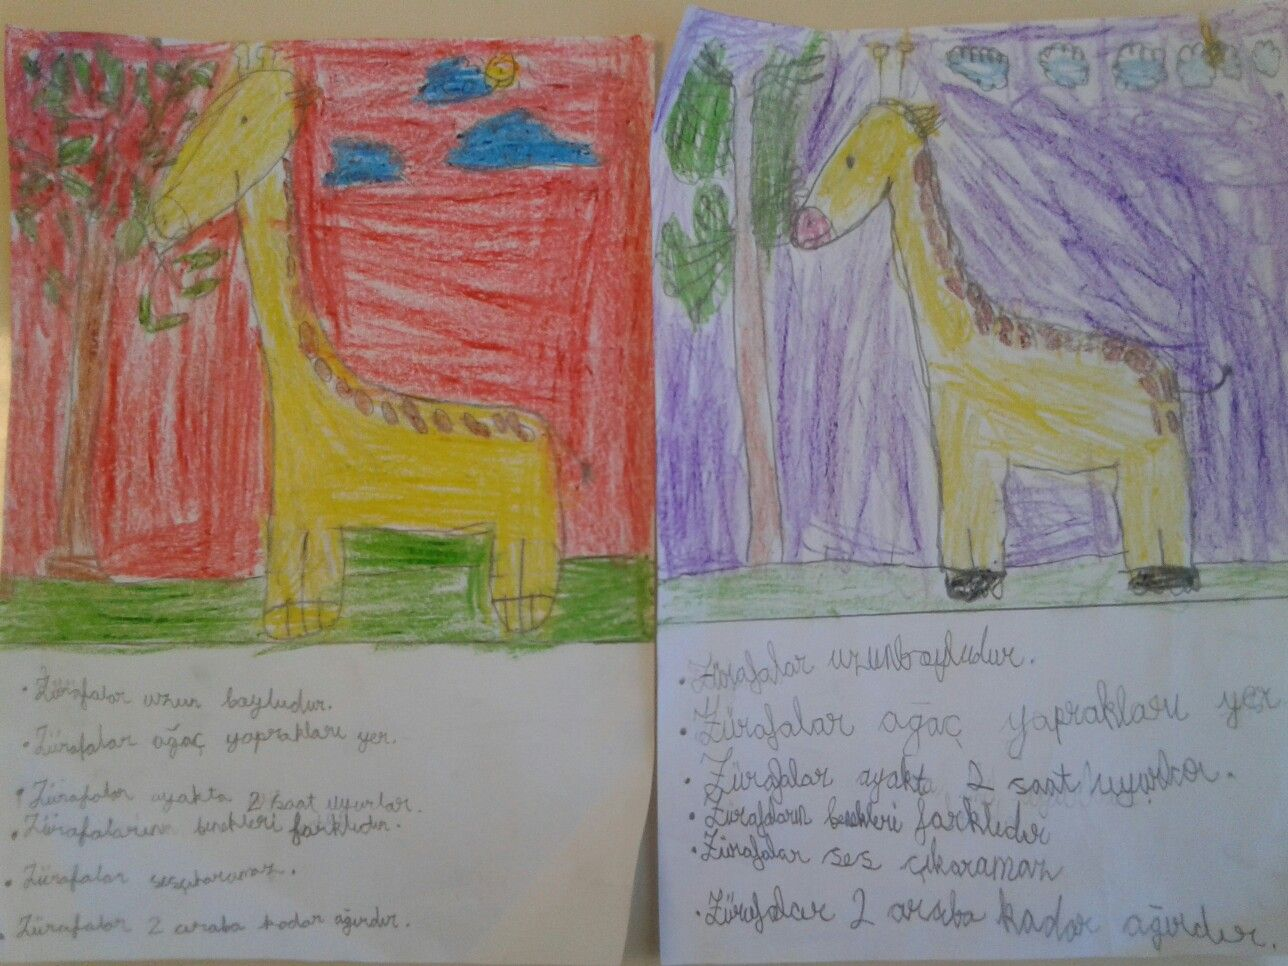 zurafalar hakkinda yazi ve gorsel calismamiz..(giraffi drawing and about writing 1st class )